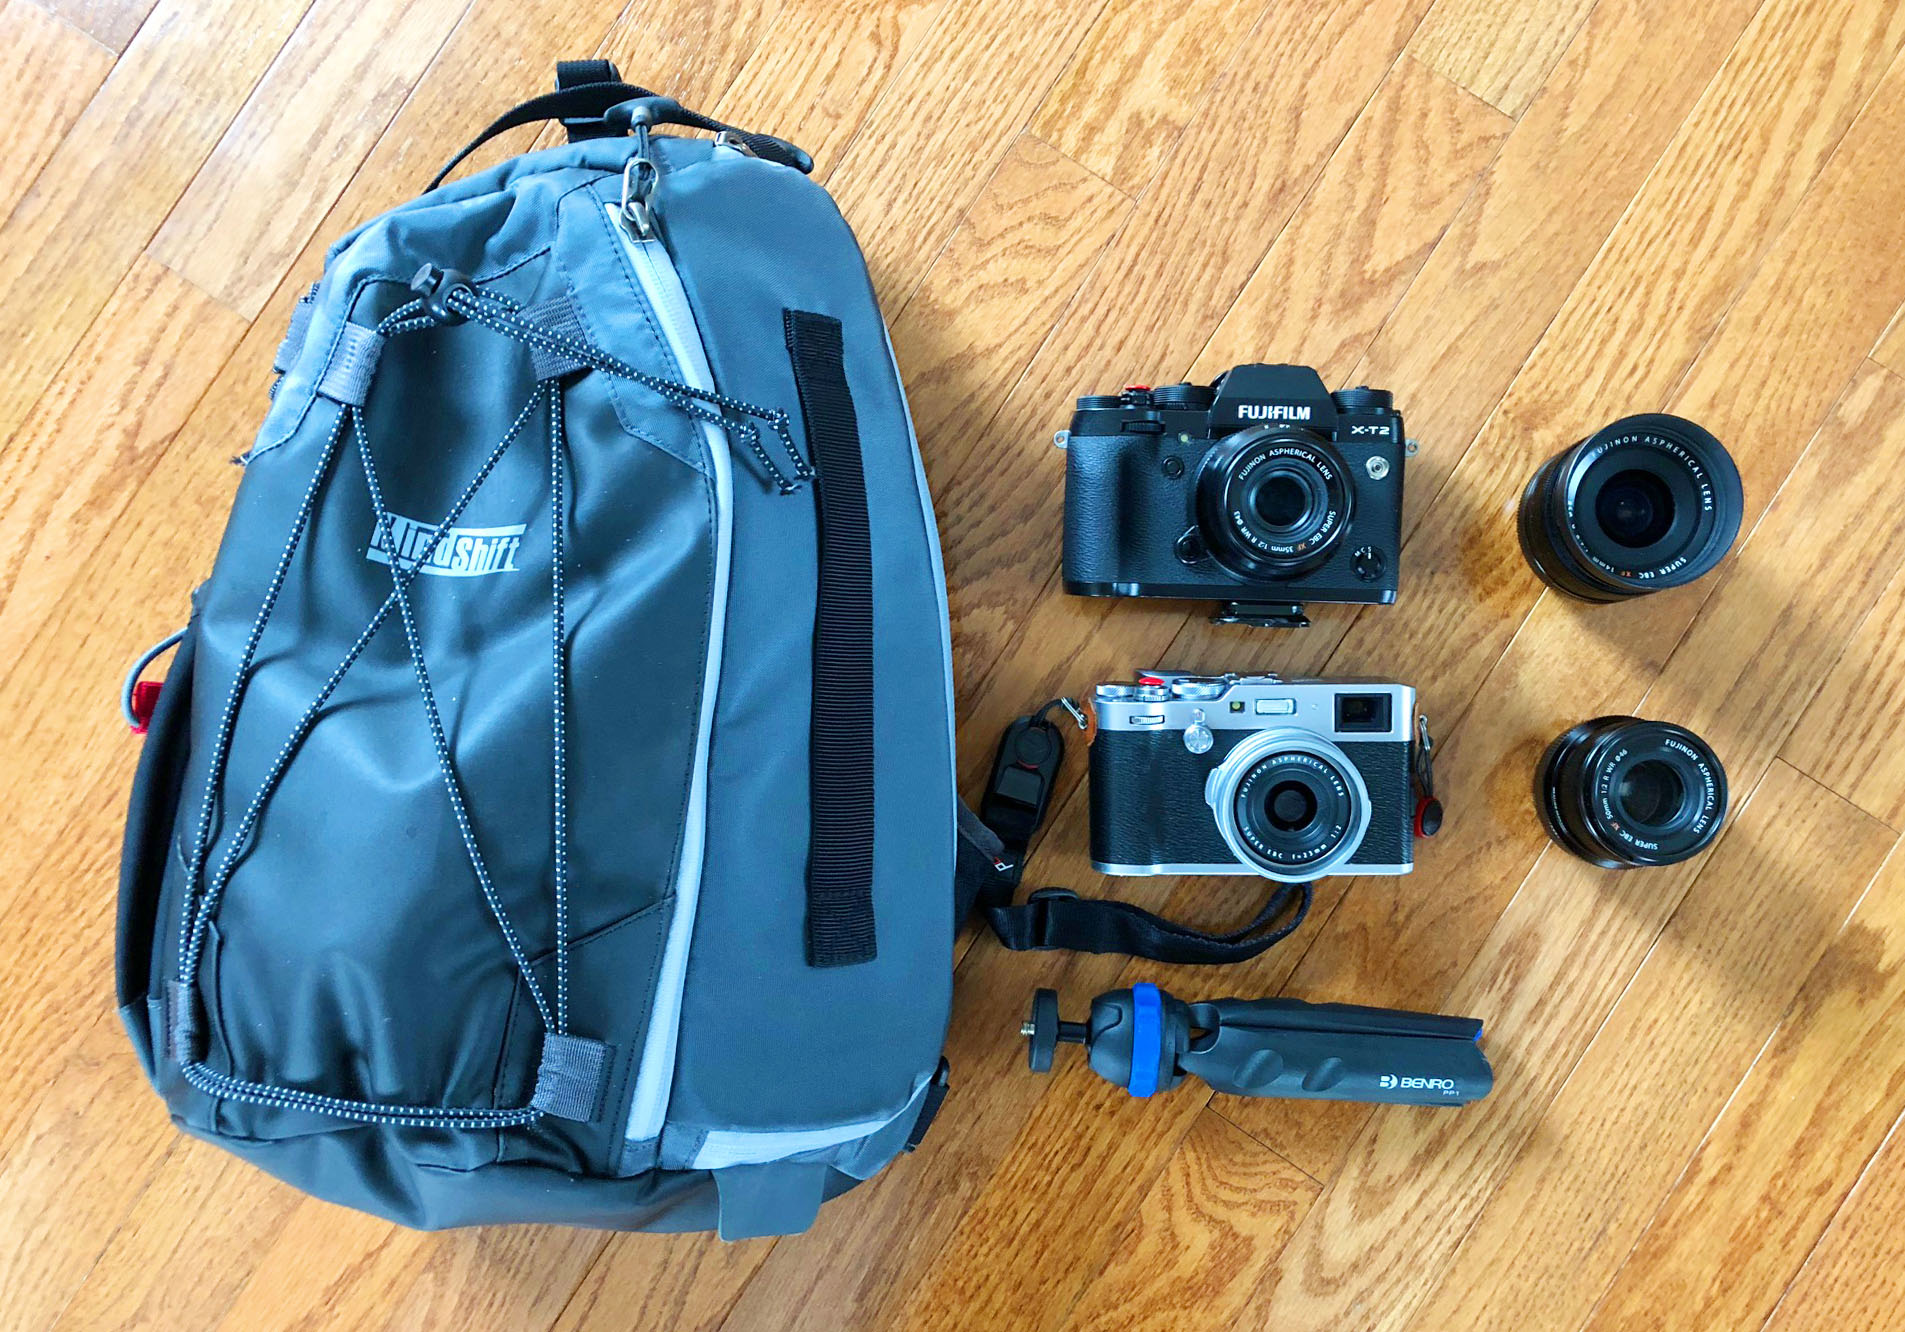 MindShift Gear Photocross Sling bag, Fujifilm X-T2, Fujifilm X100F, Benro PP1 mini tripod